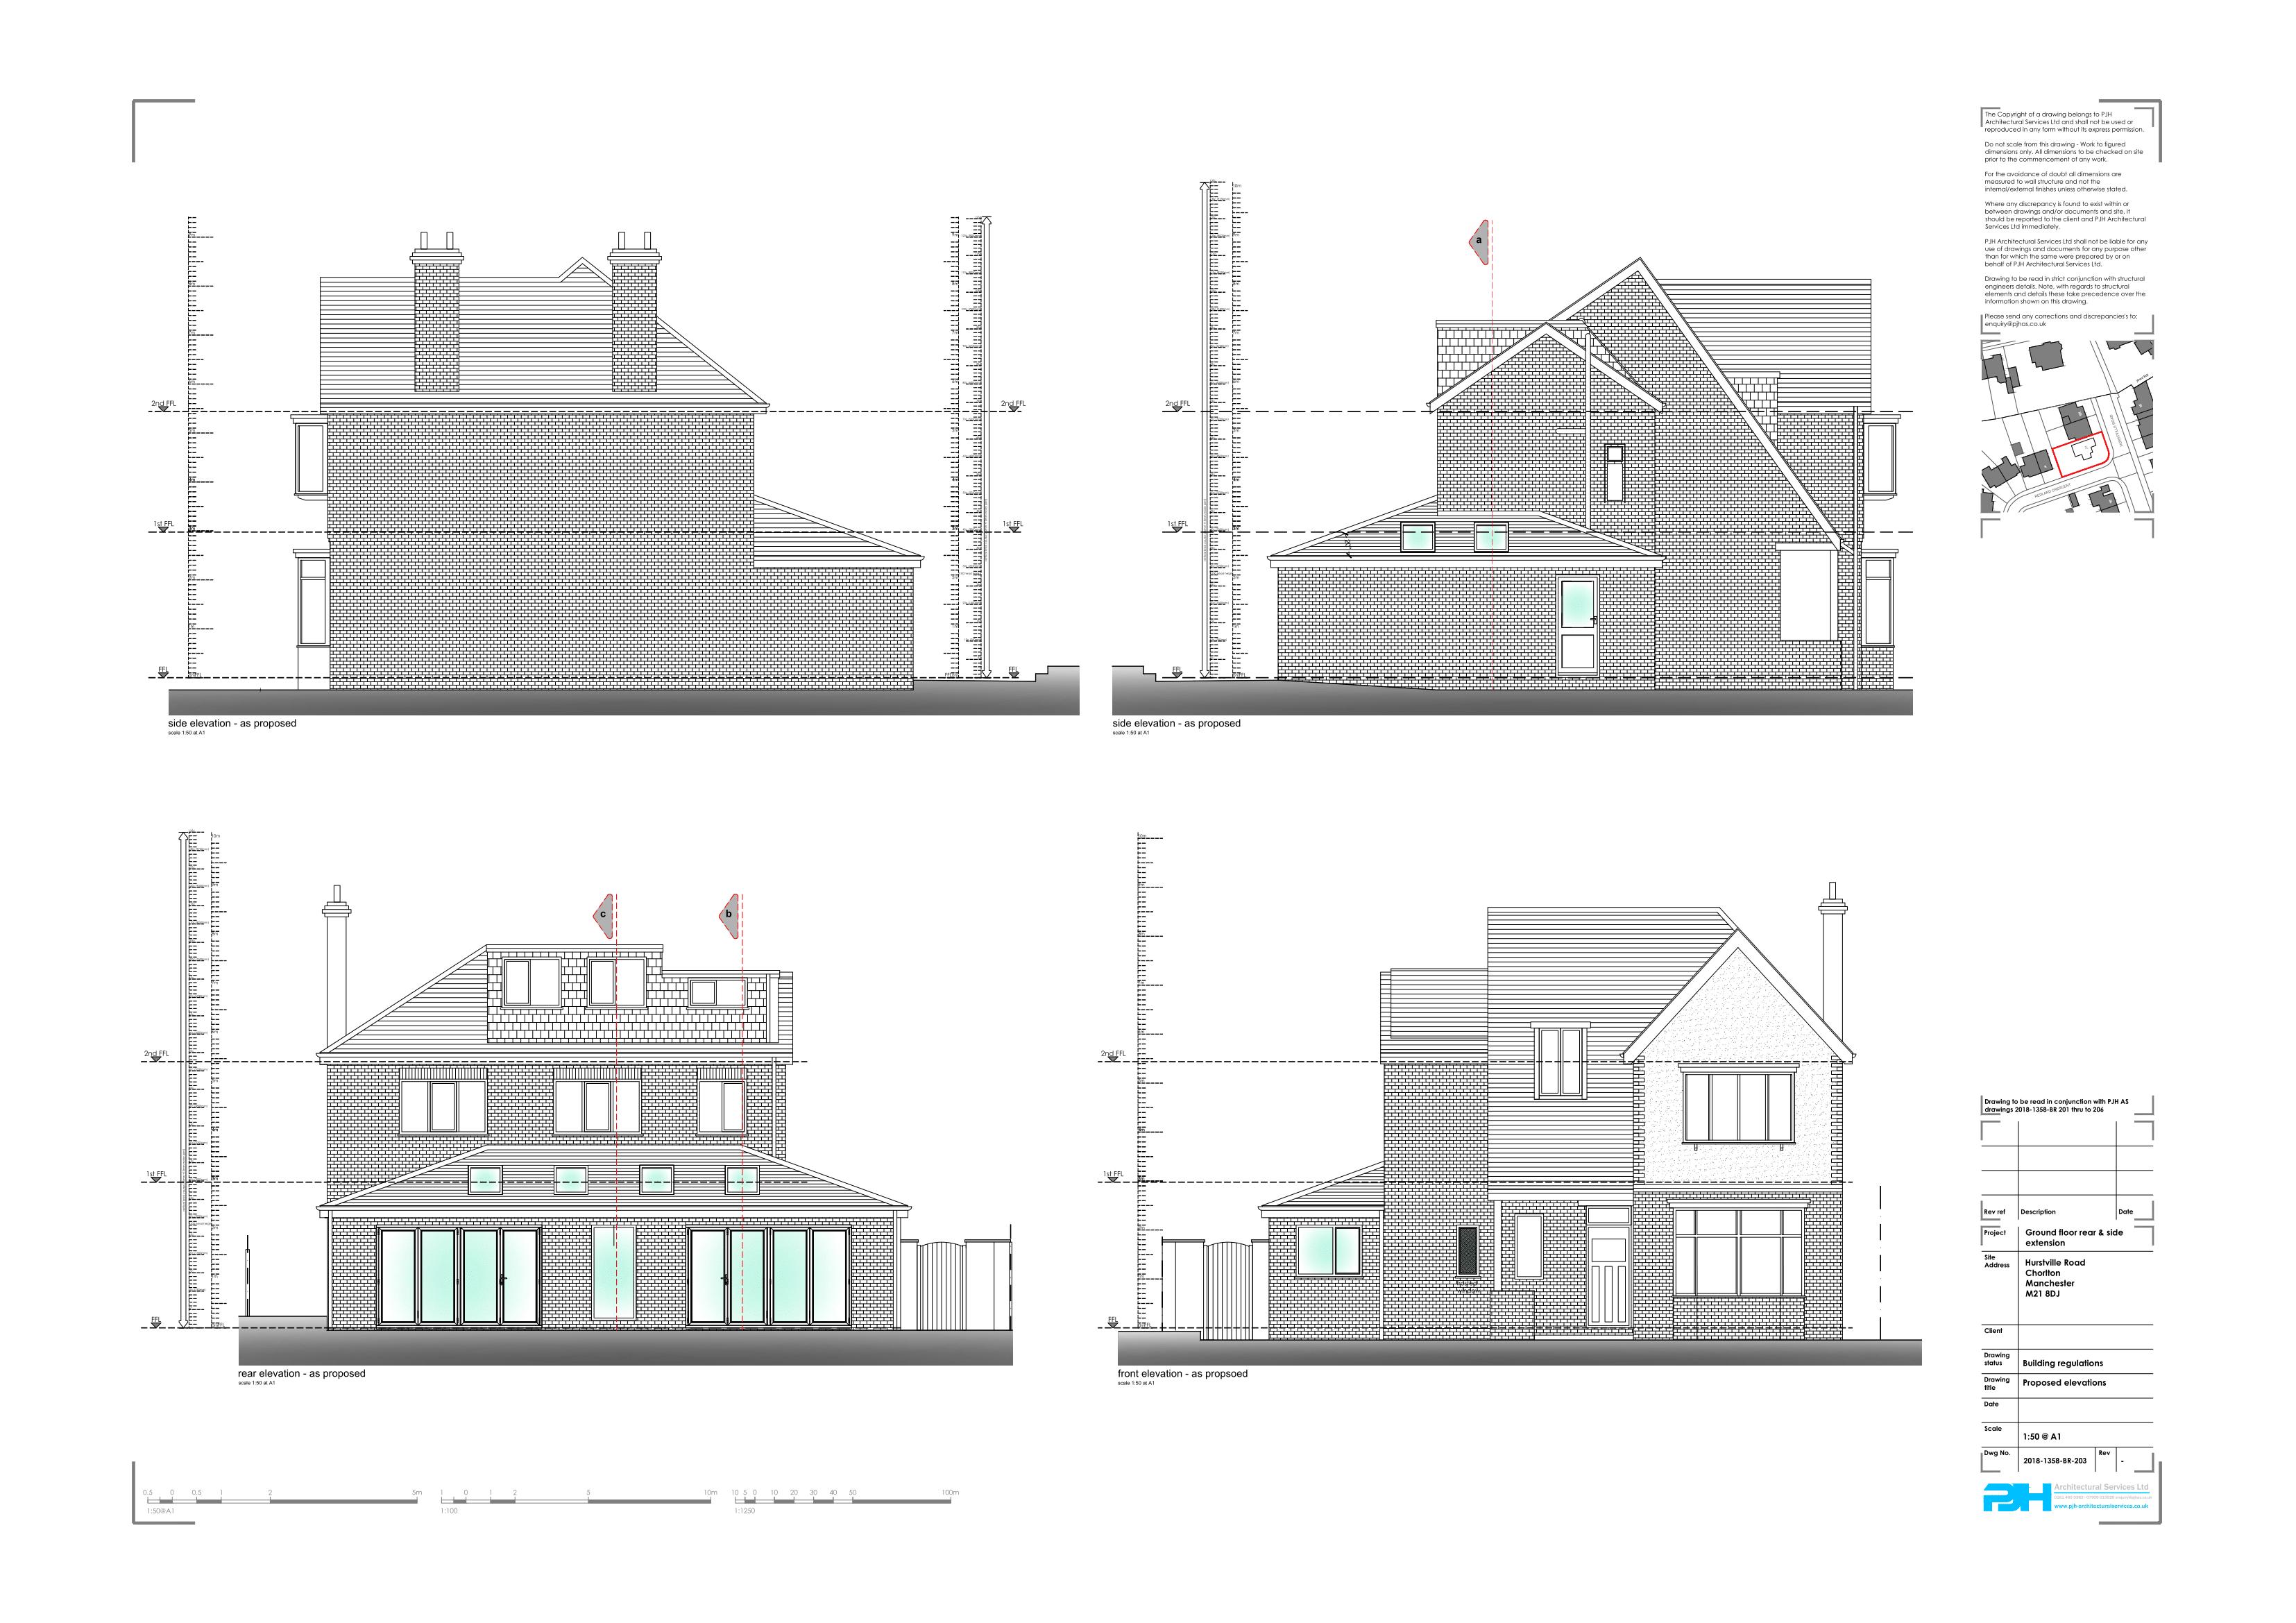 Architectural Plans Chorlton